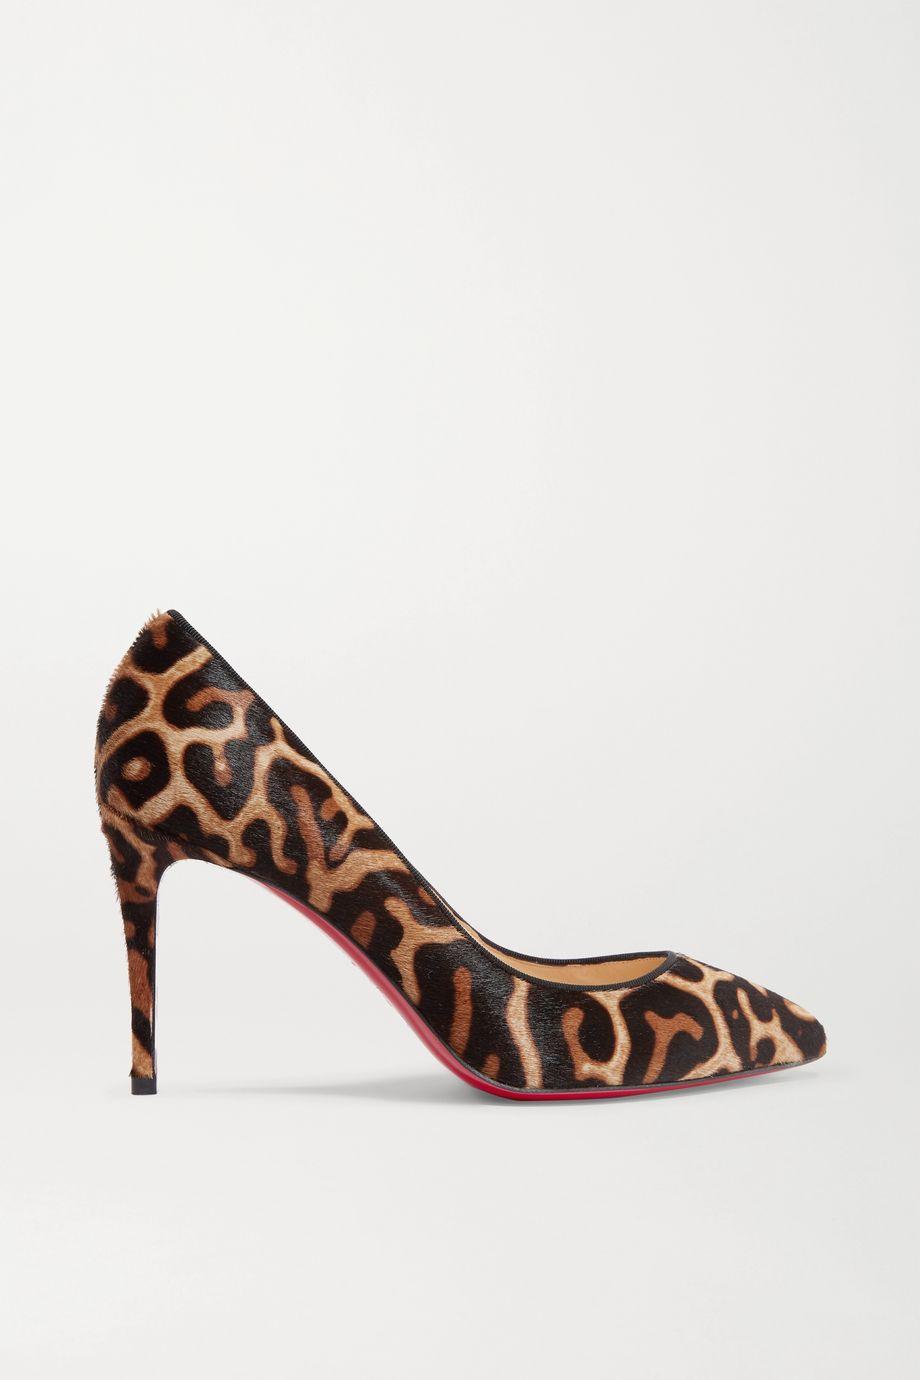 Christian Louboutin Pigalle Follies 85 leopard-print calf hair pumps